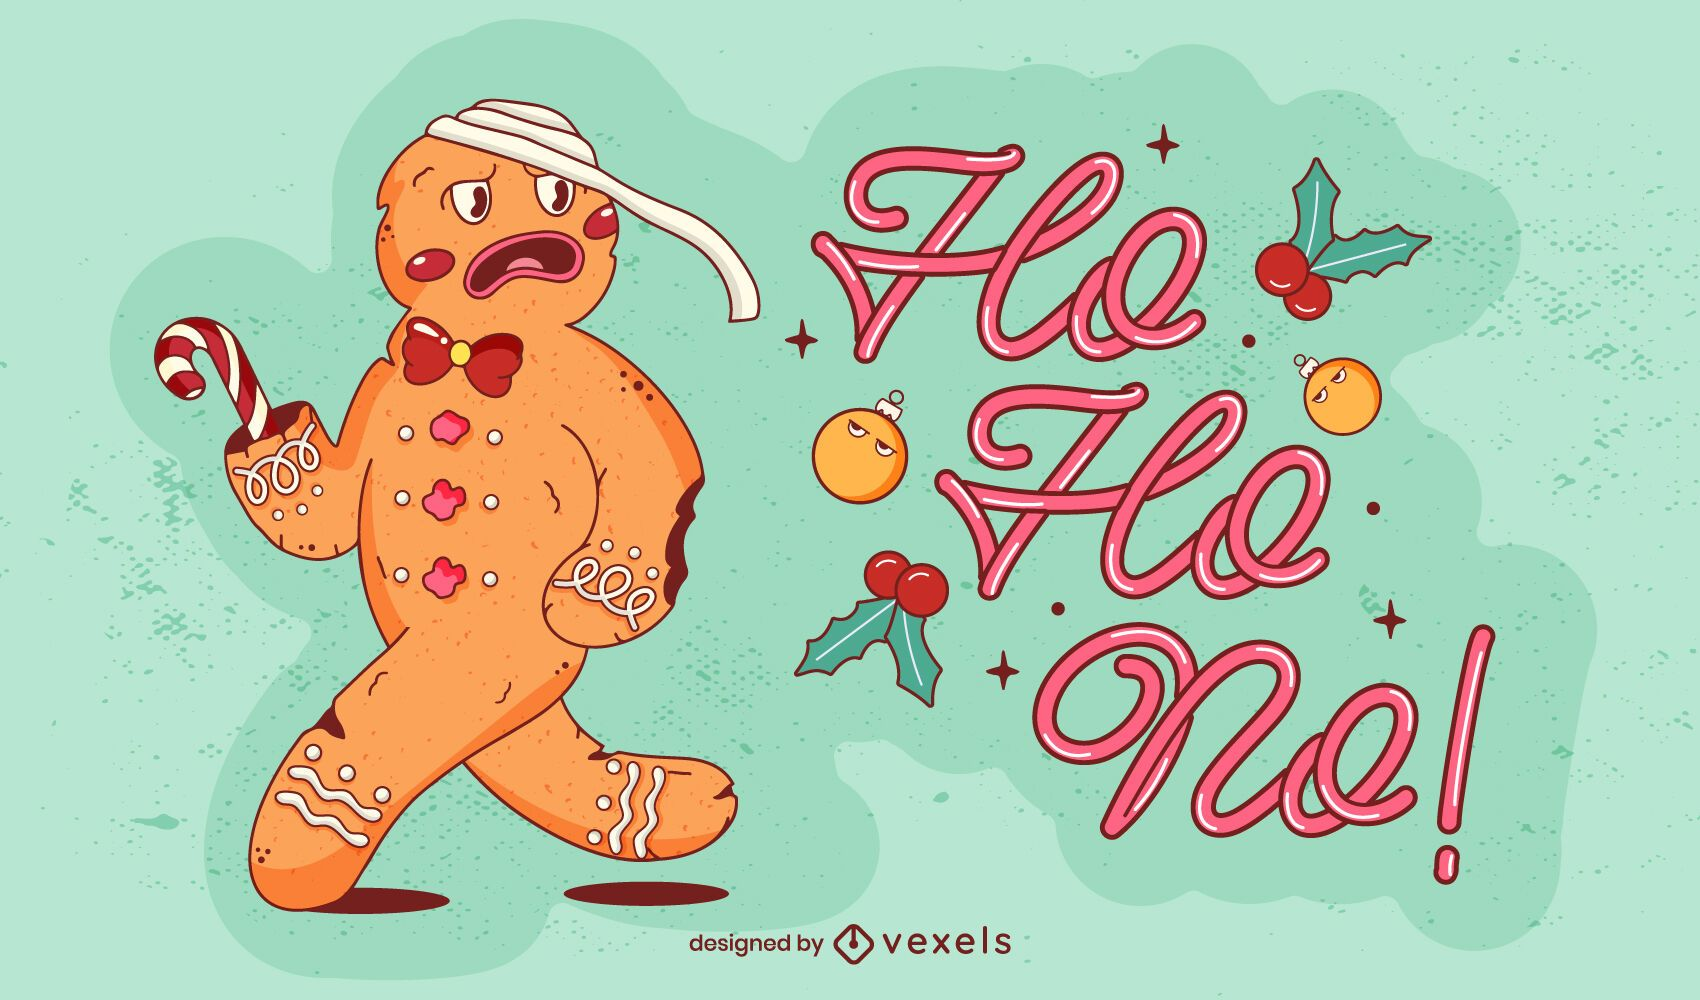 Ho ho no illustration design